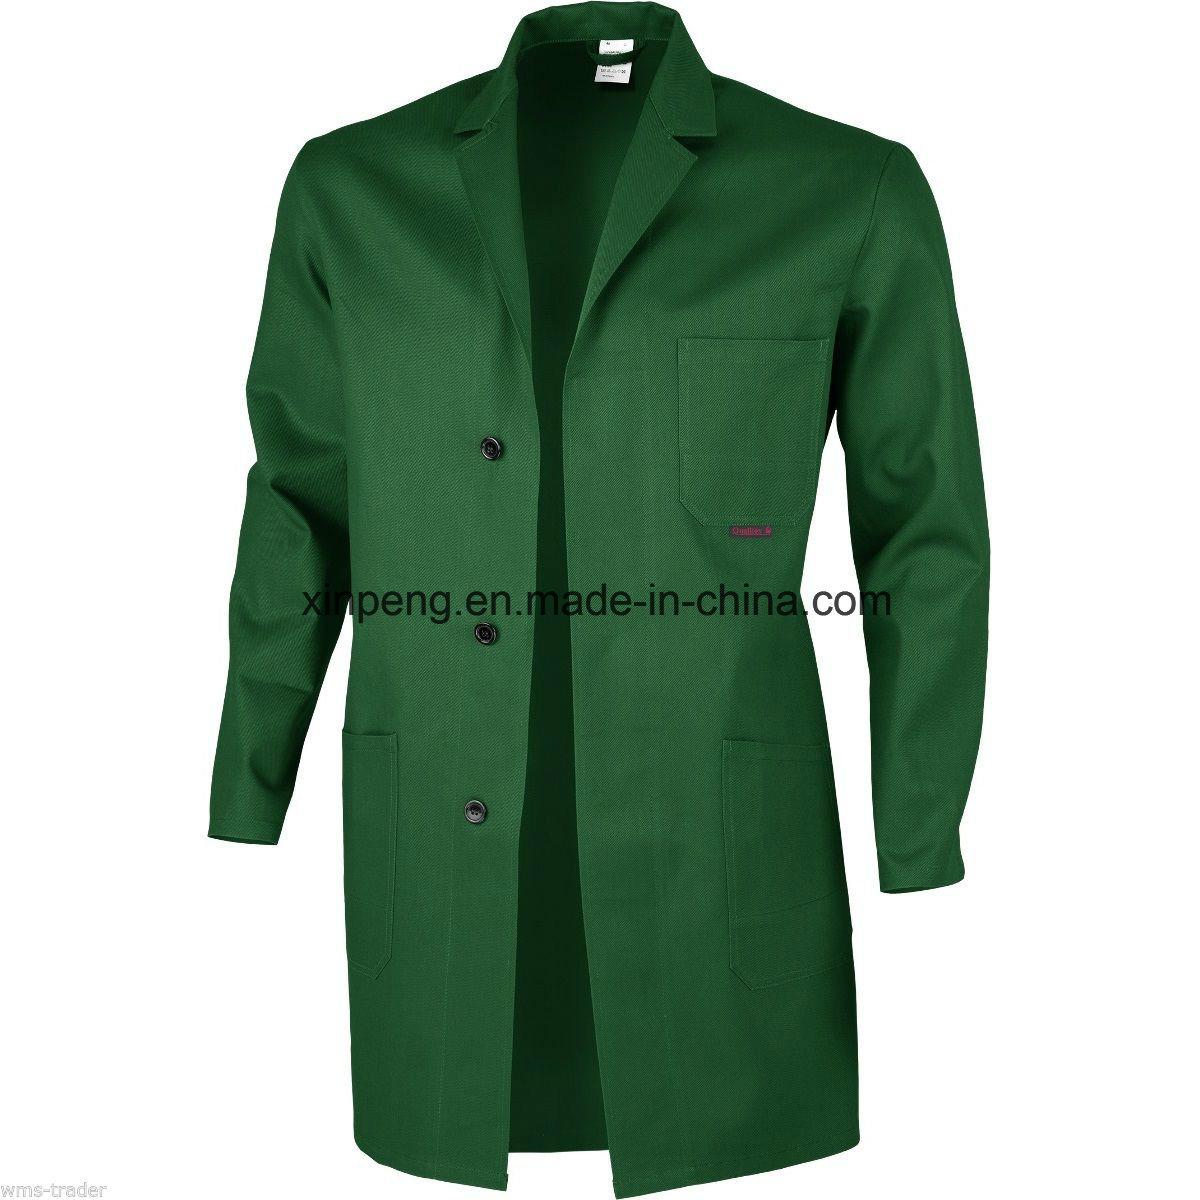 La′b Coat Basic Design with 3 Pockets